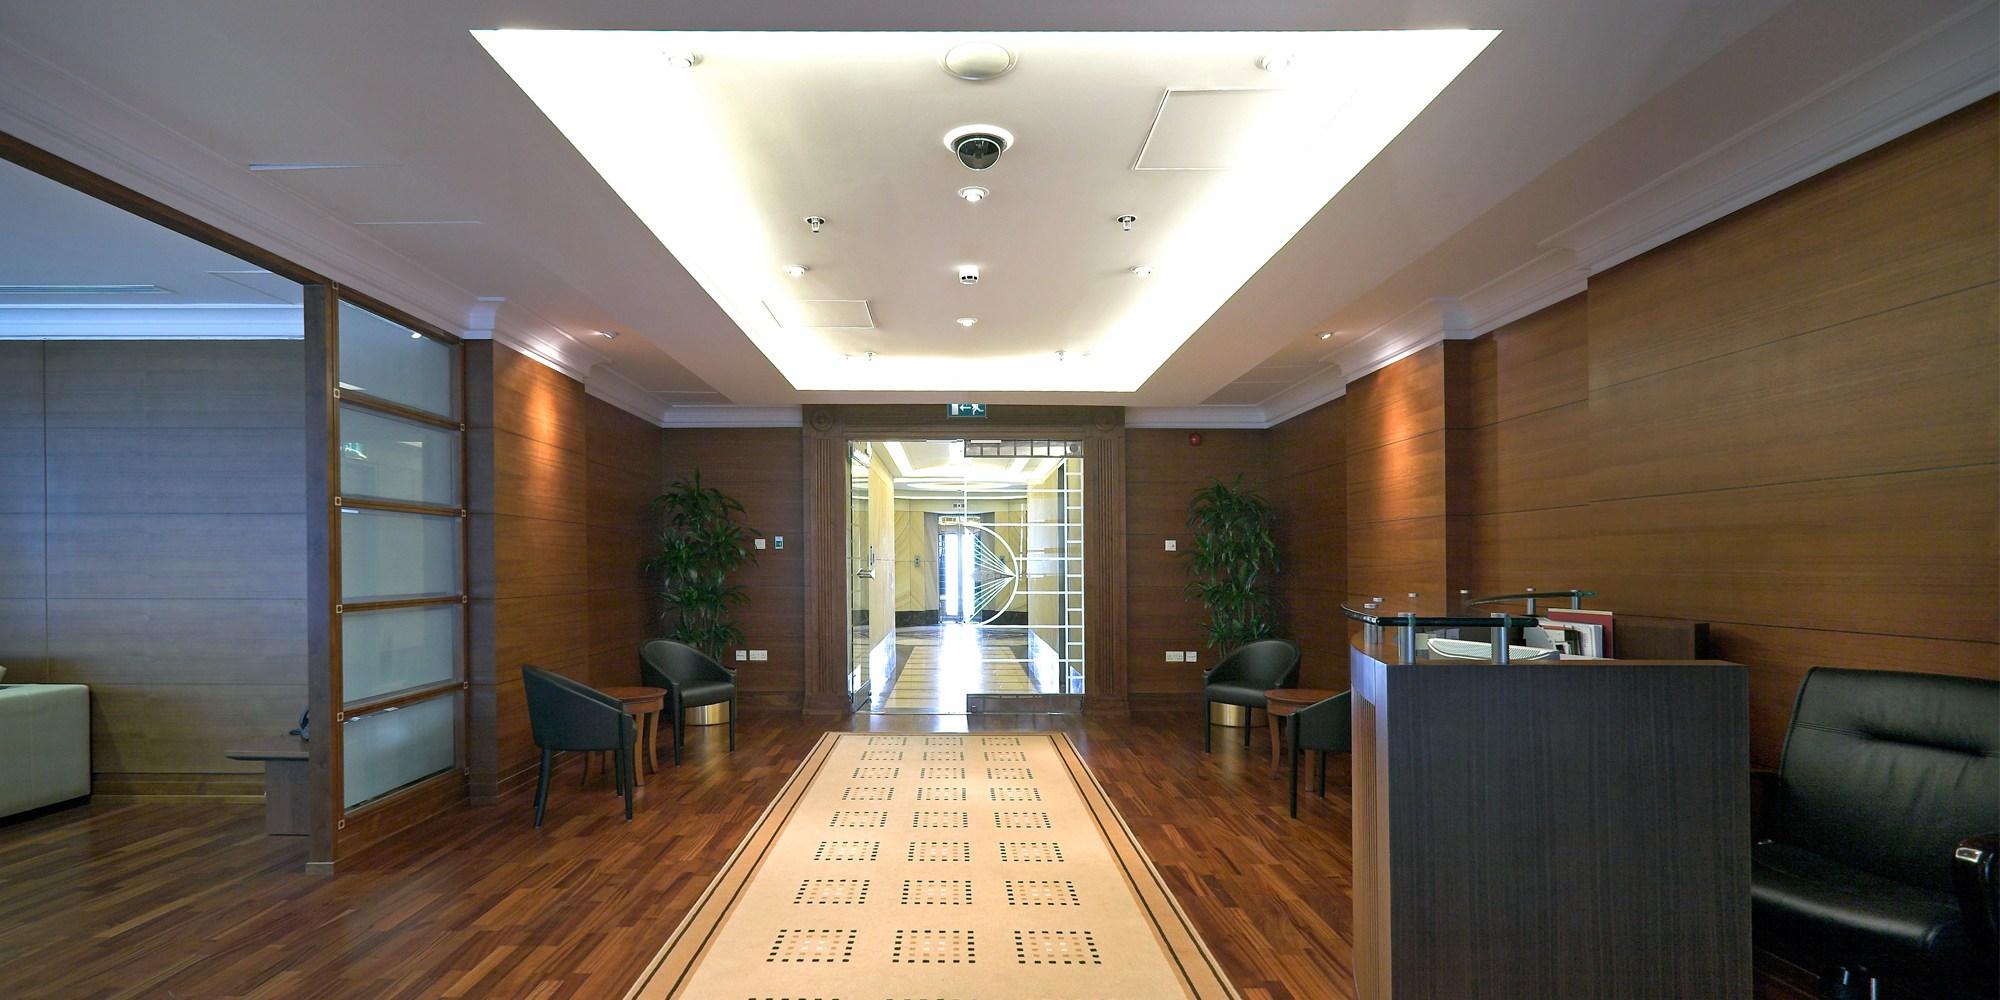 <p>National Bank Of Kuwait - NBK</p>